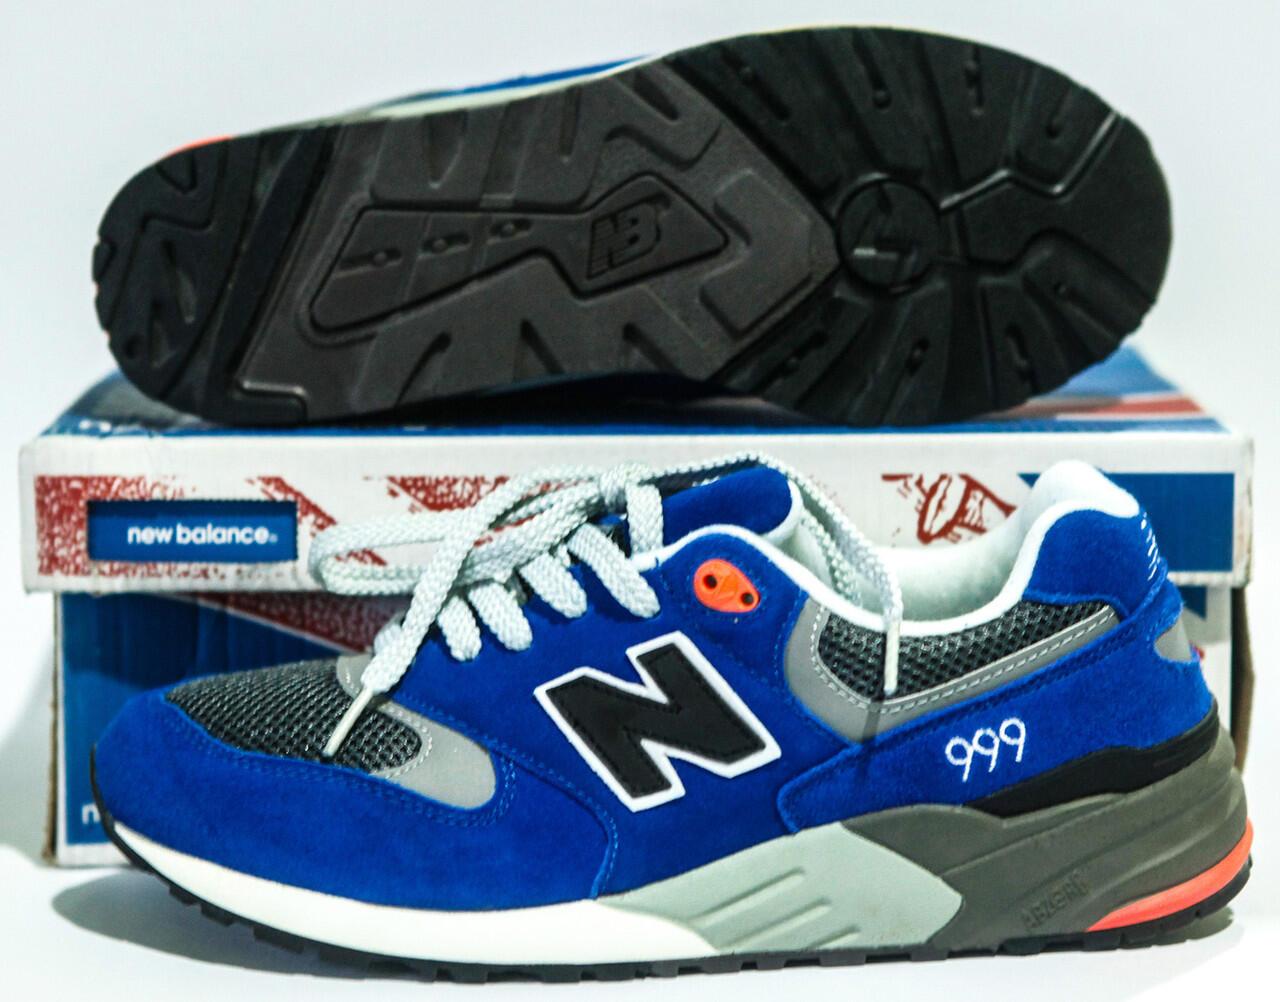 nike air max ltd chaussures de course d'hommes - perbedaan sepatu new balance original dan palsu- A table !